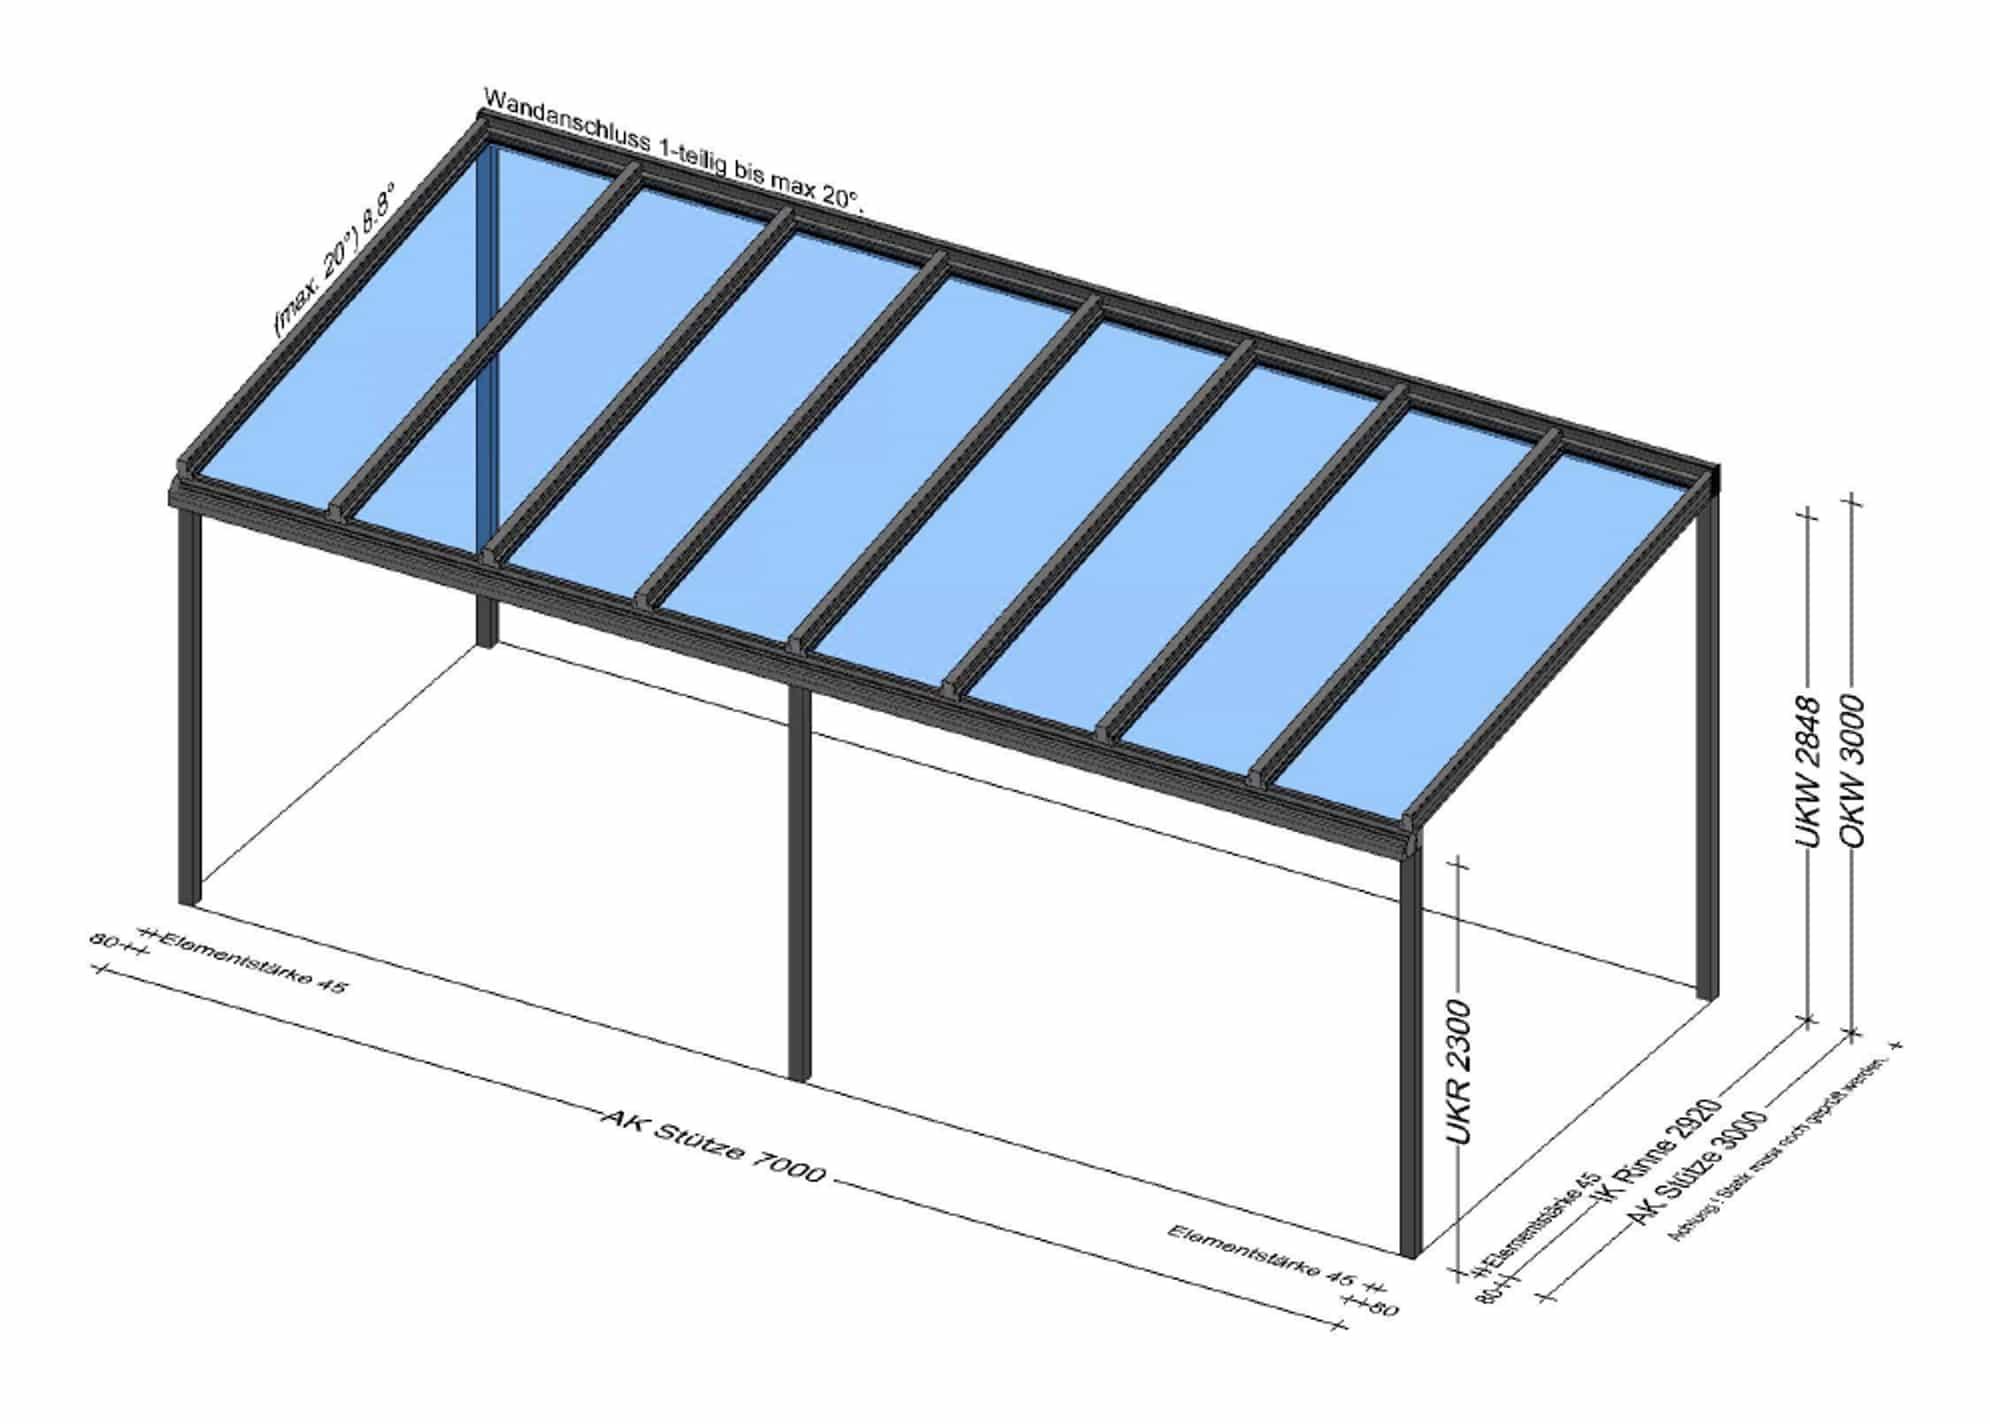 Terrassenüberdachung 7x3 in Hörsching